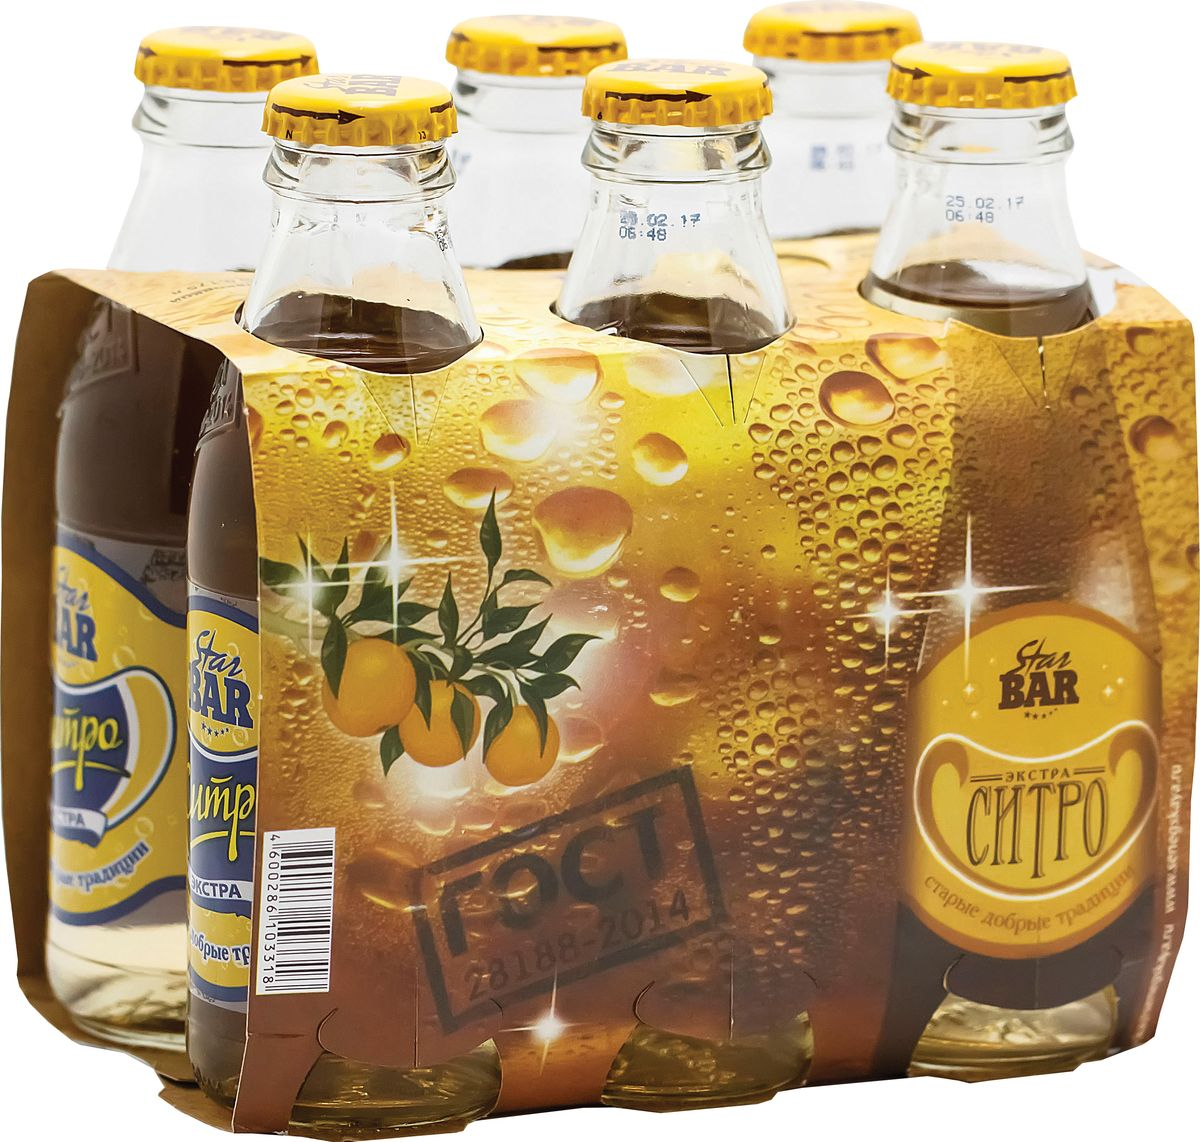 Star Bar Лимонад экстра-ситро, 6 шт по 0,175 л